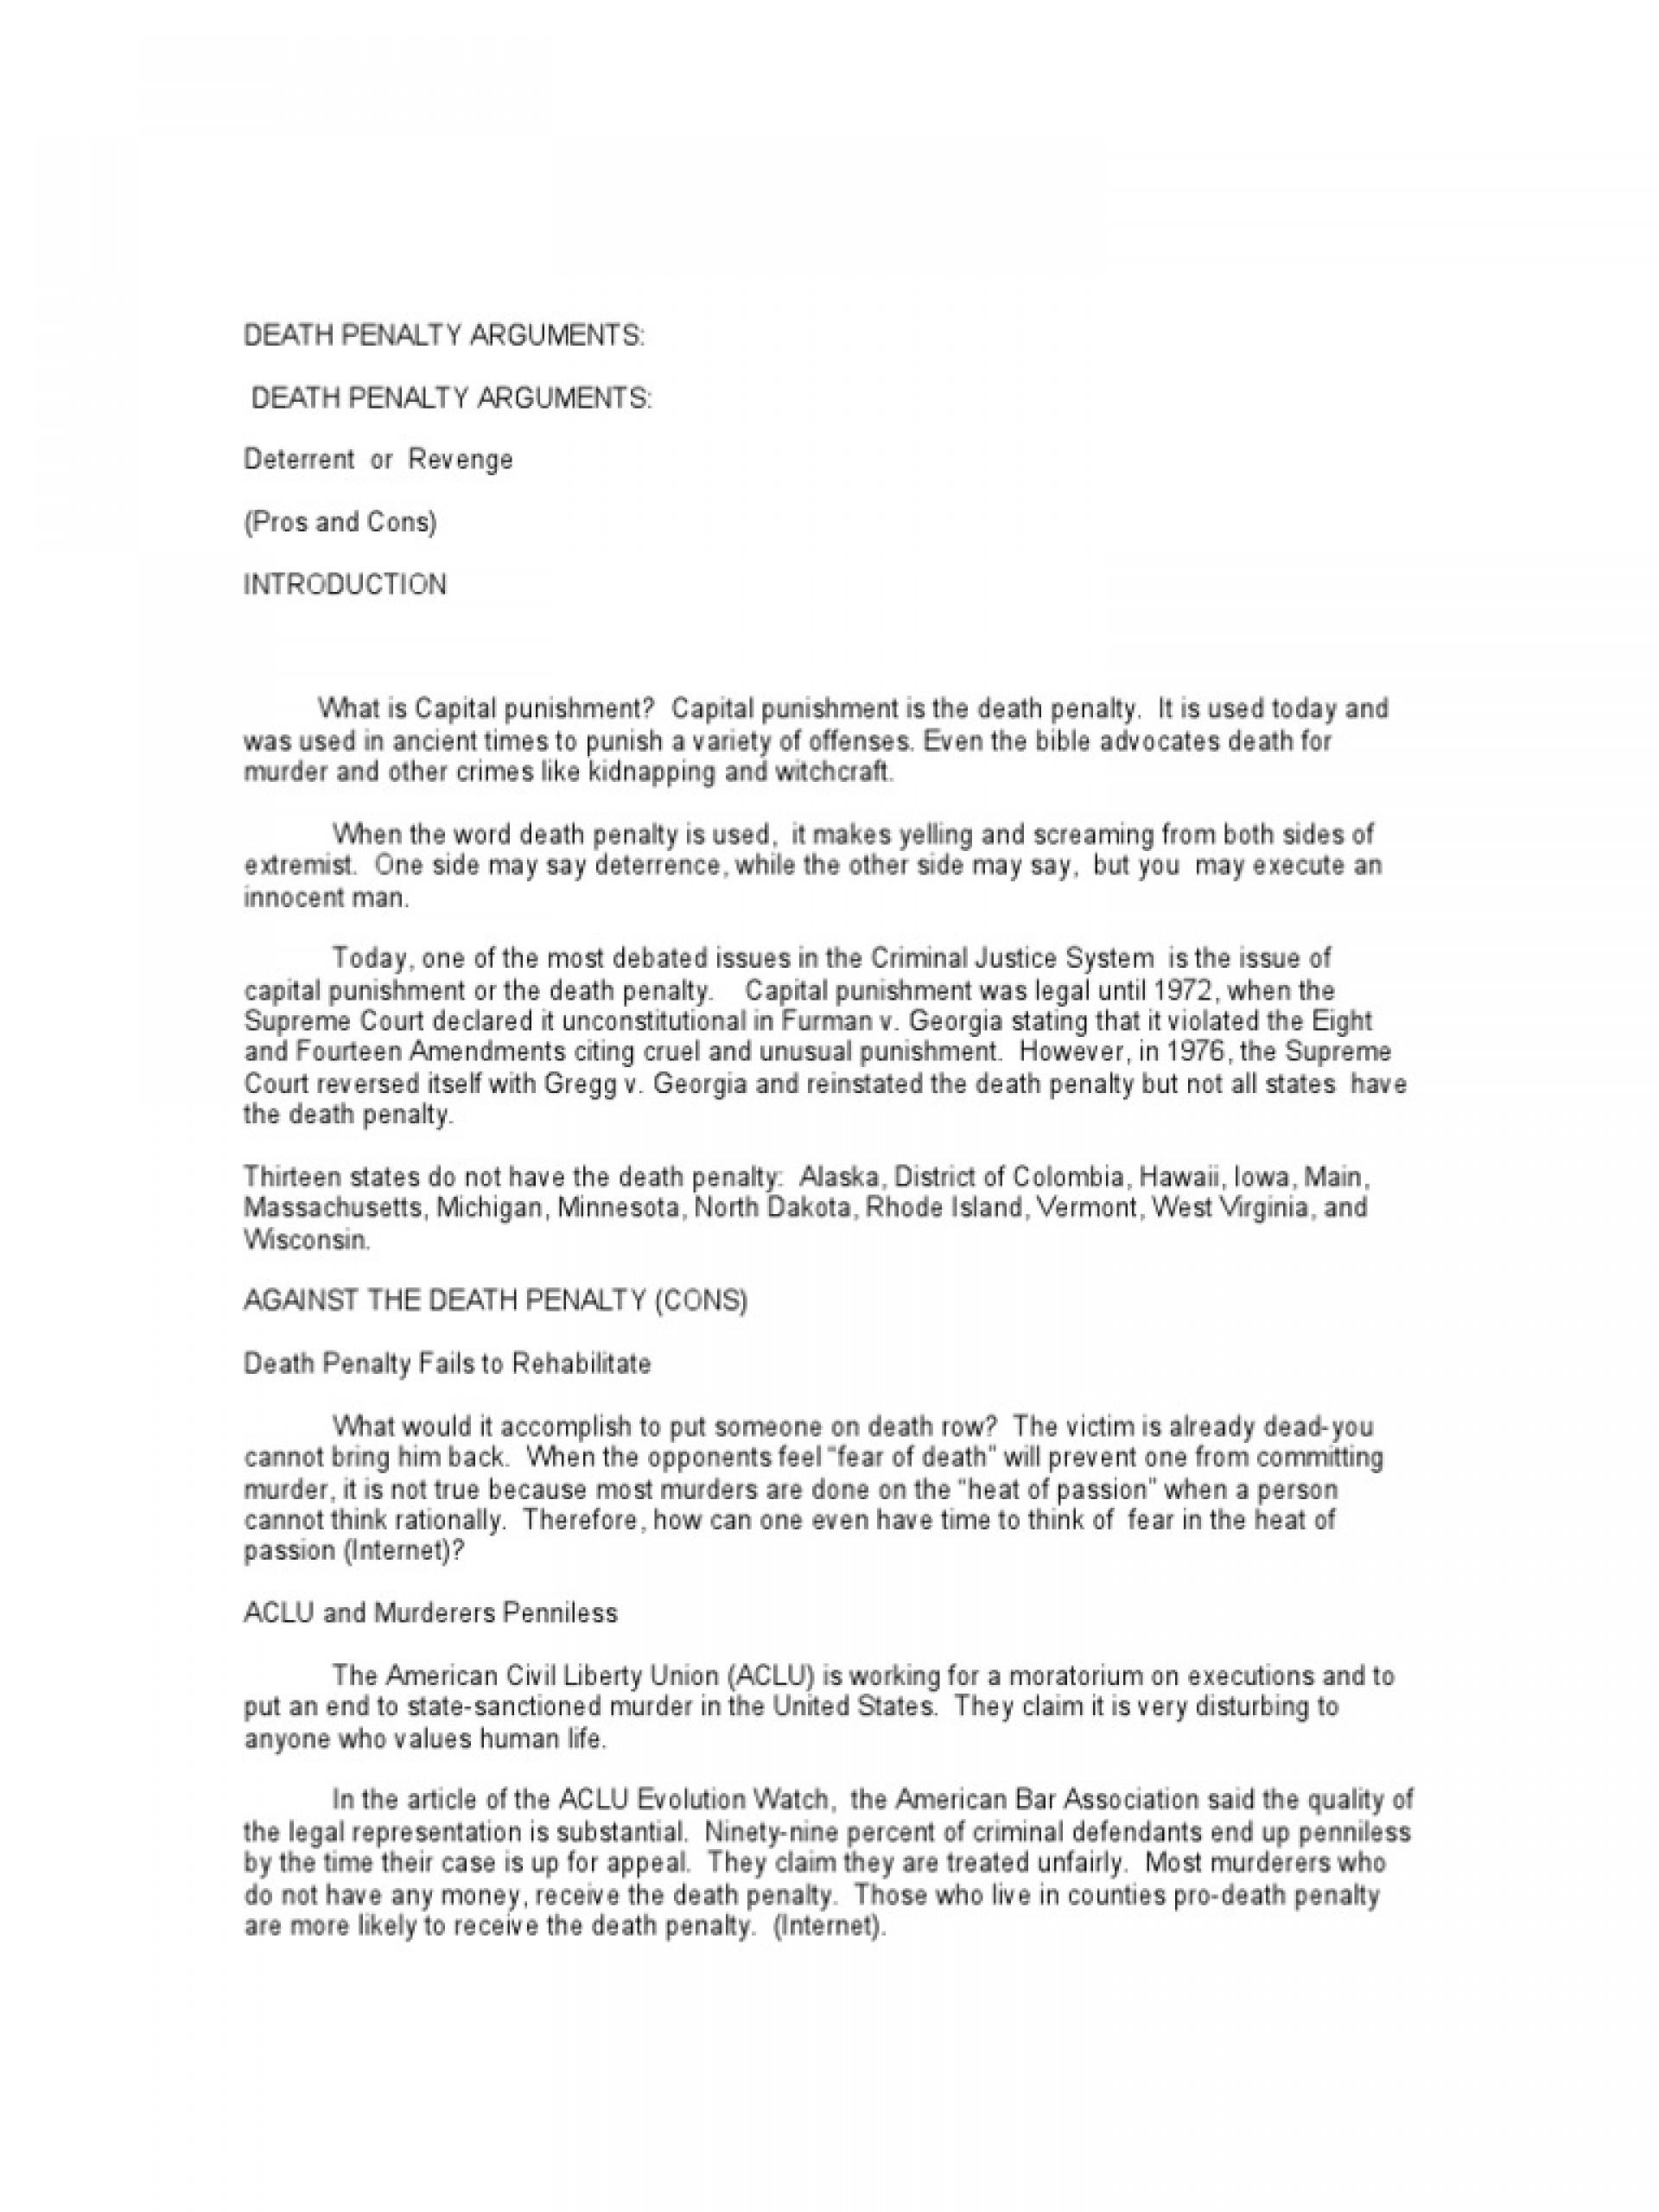 020 Argumentative Essays On The Death Penalty Pro Ornellas Position Paper Outline Term Essay Persuasive Against Sensational Anti Conclusion Hook For 1920